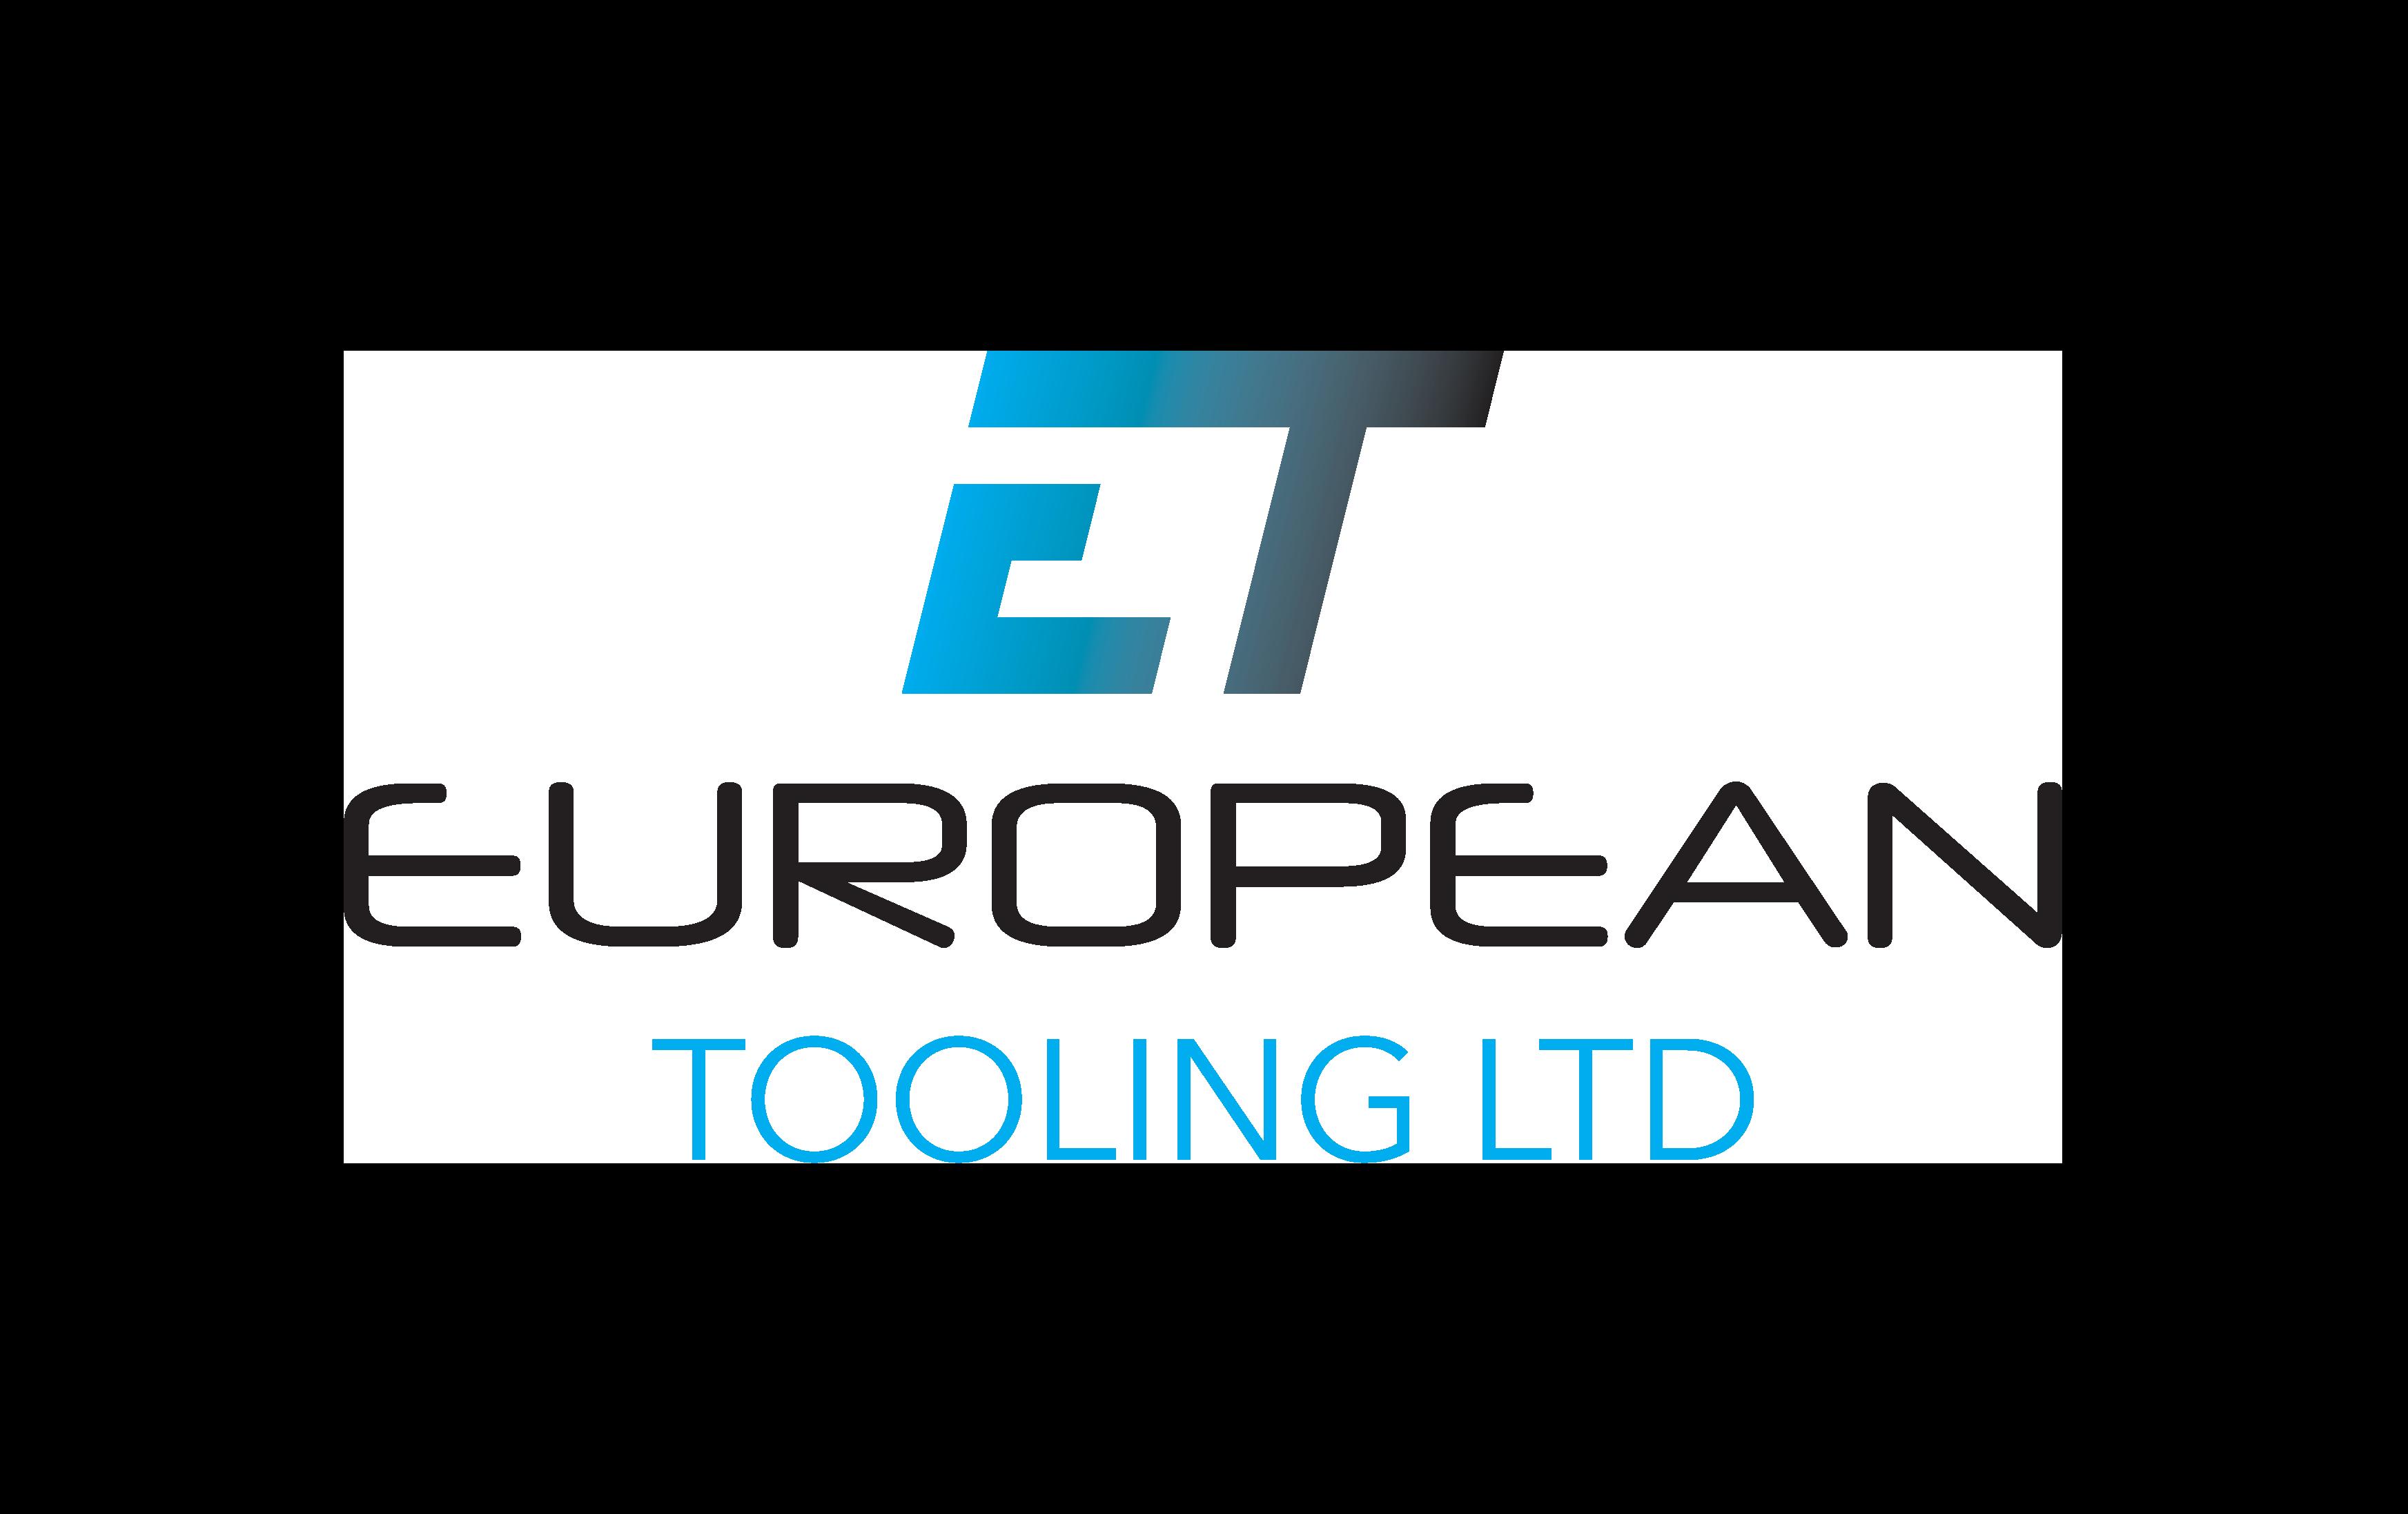 European Tooling Ltd